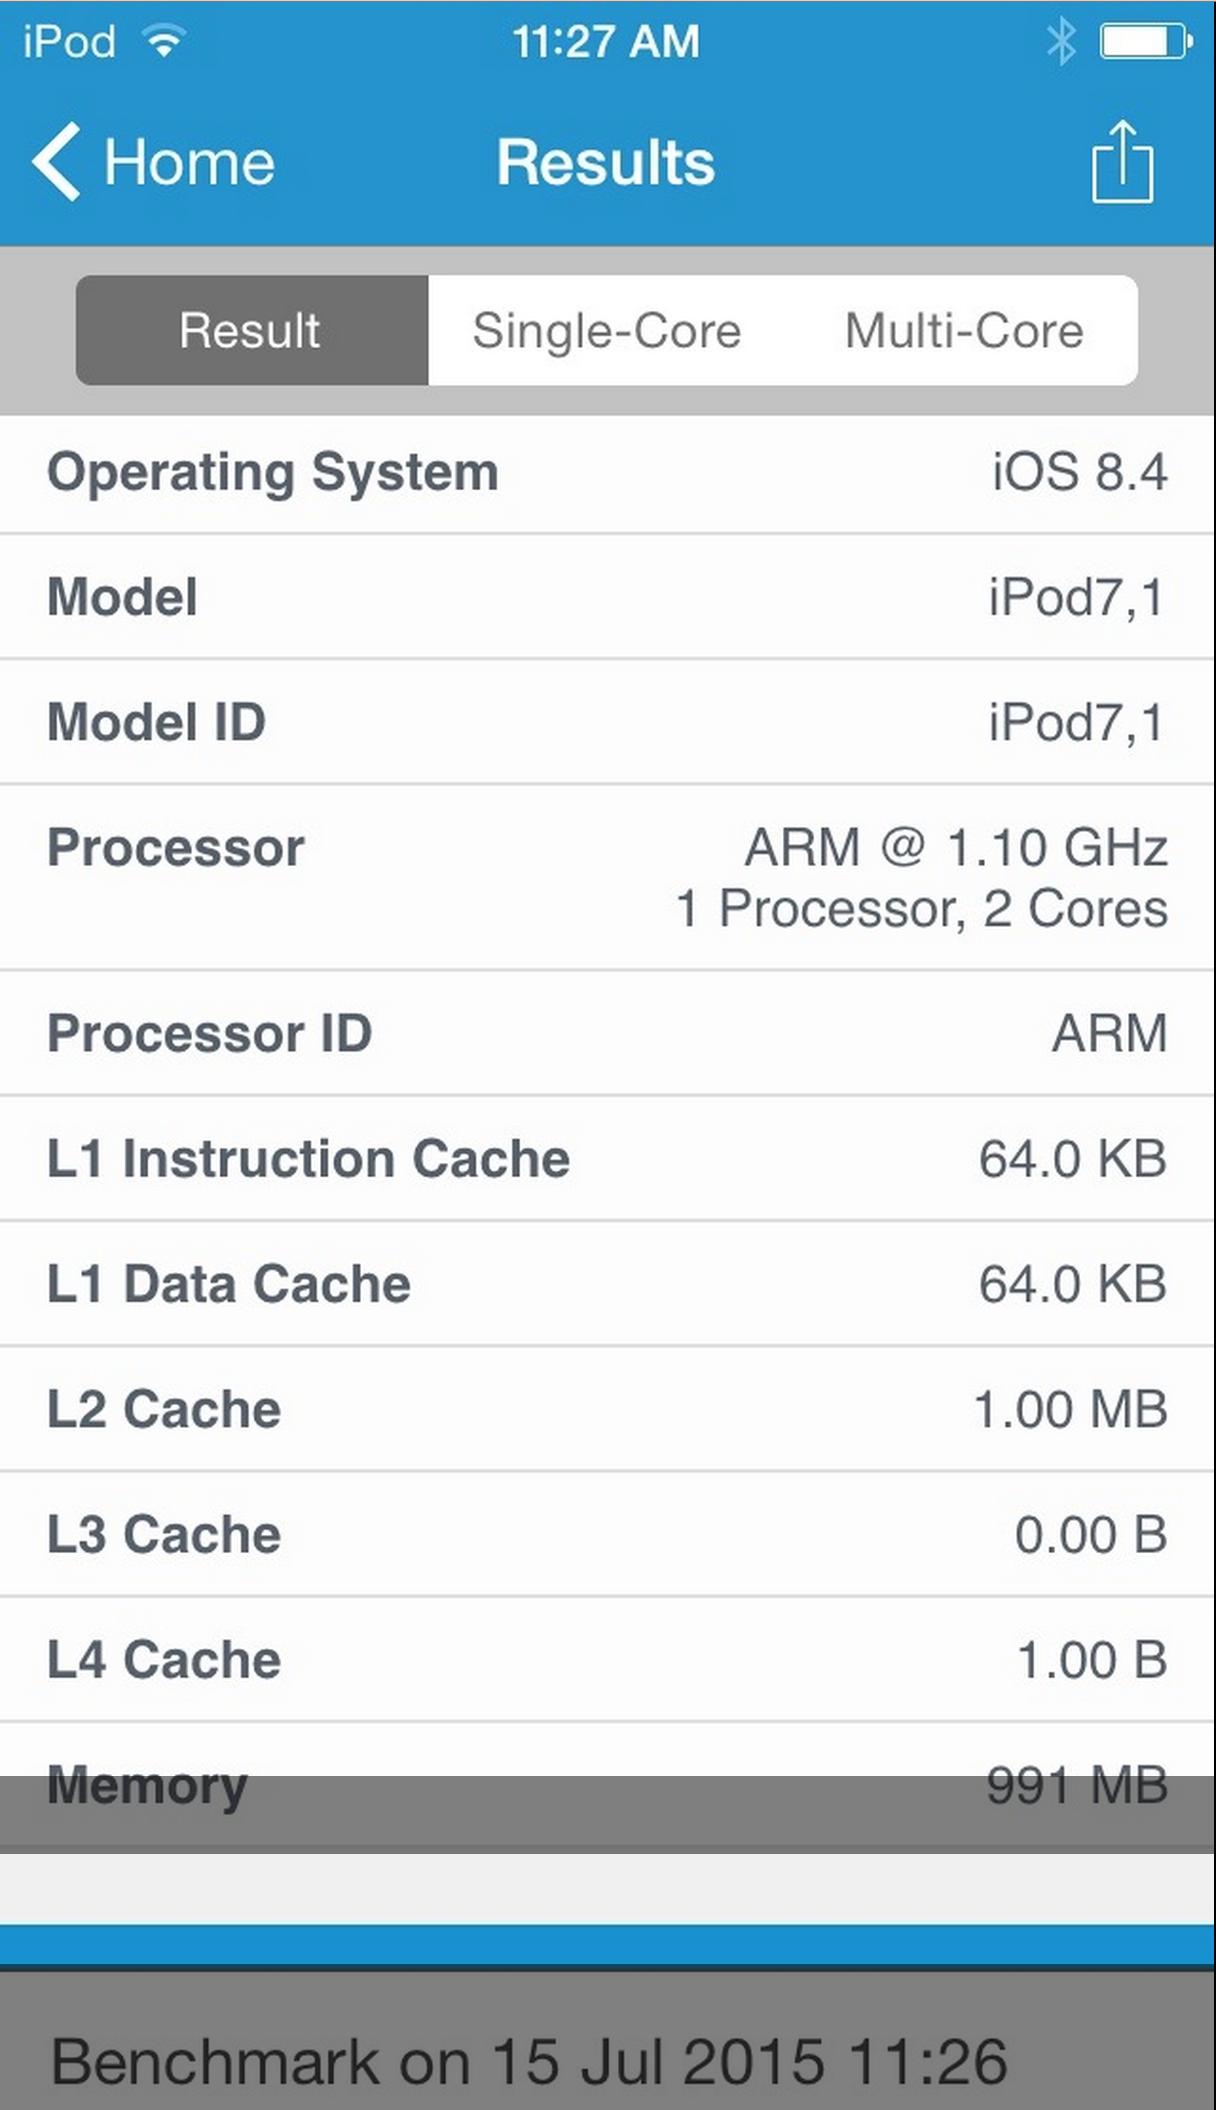 ipod benchmarks